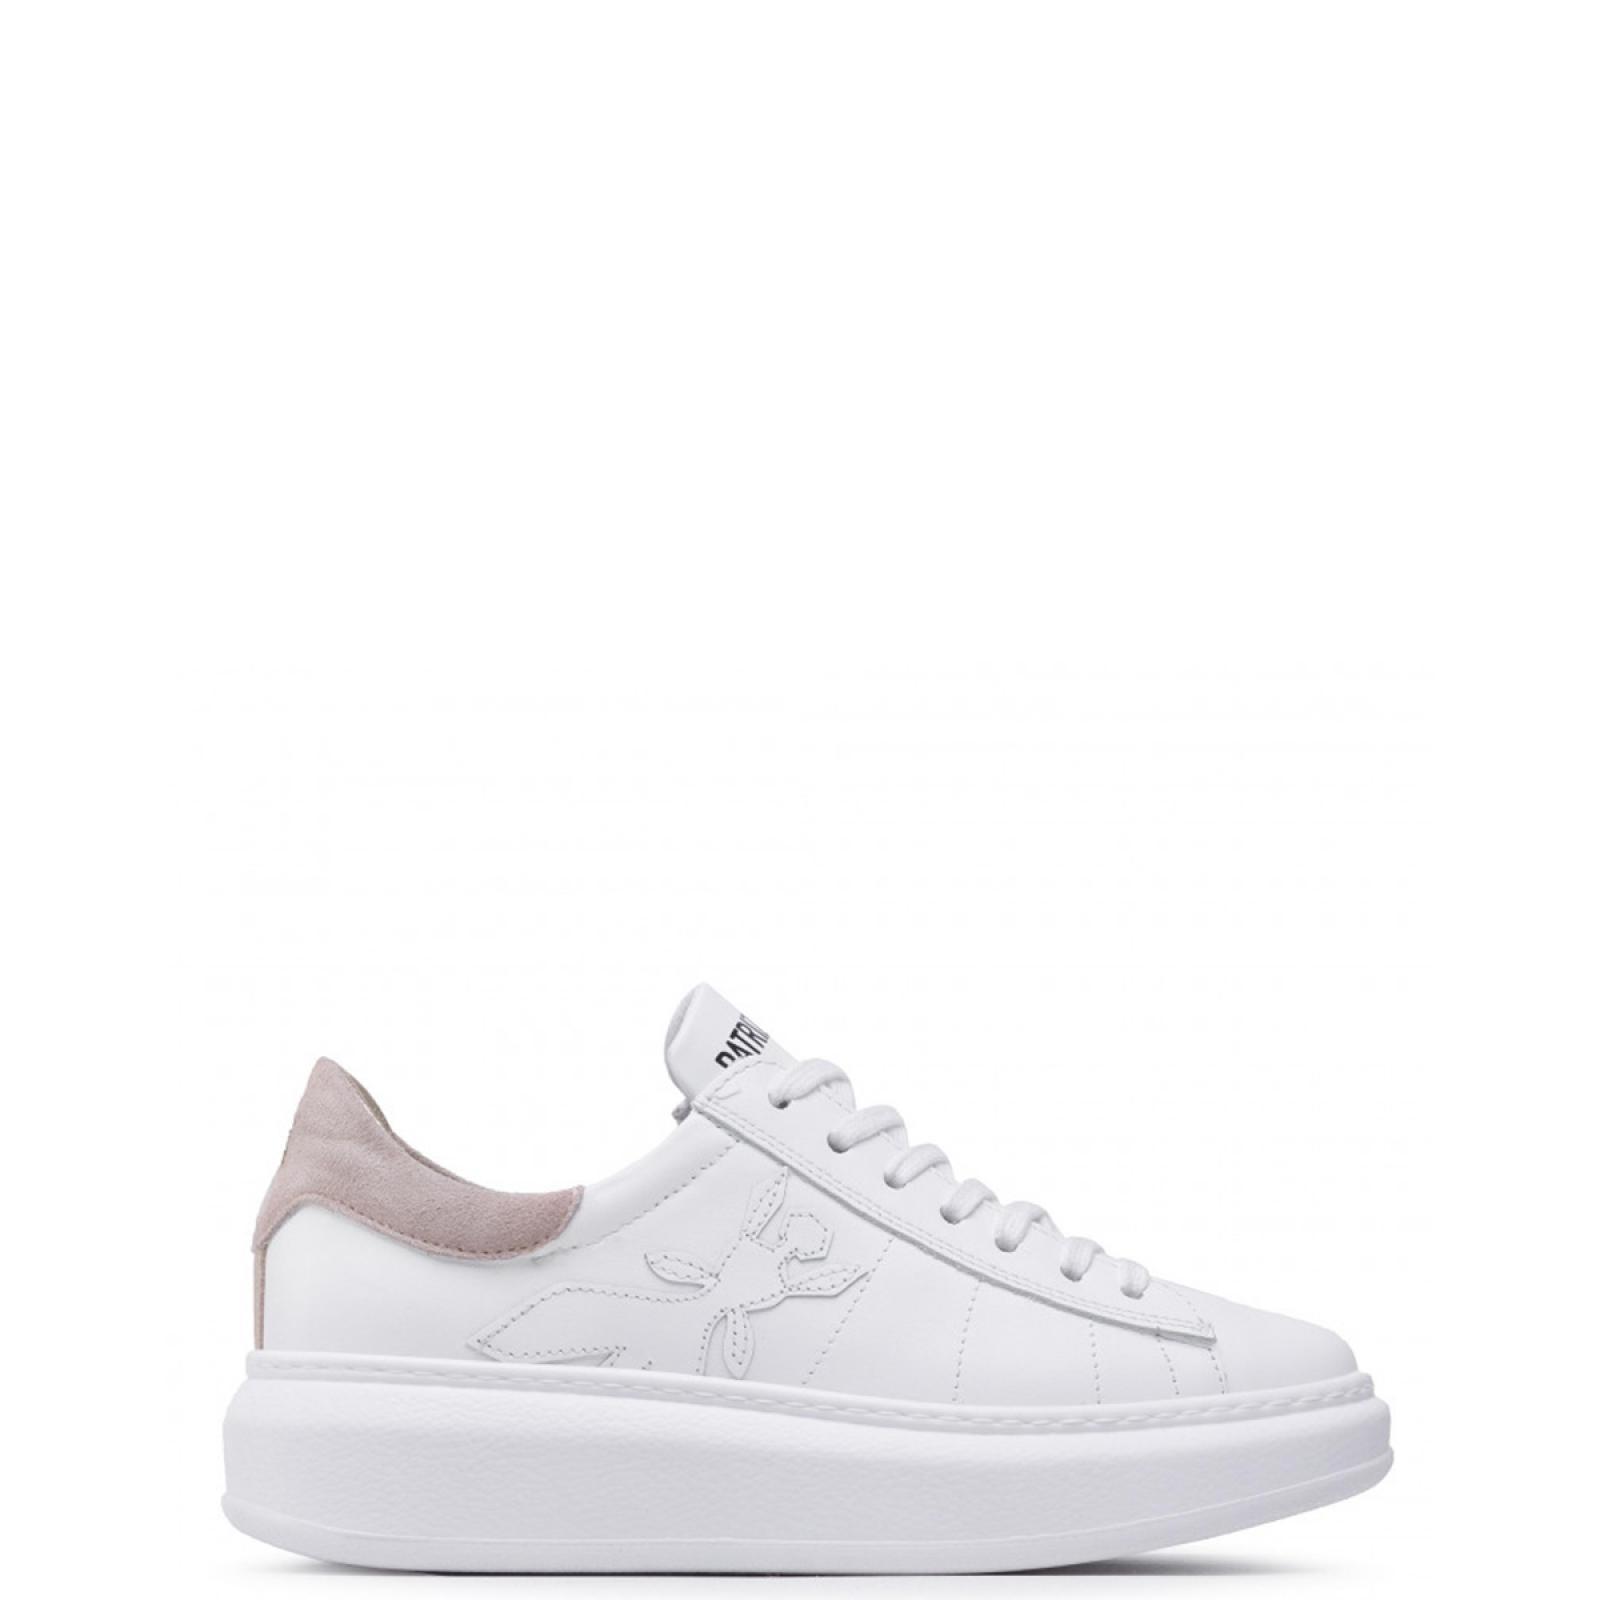 Patrizia Pepe Sneakers Platform in pelle - 1